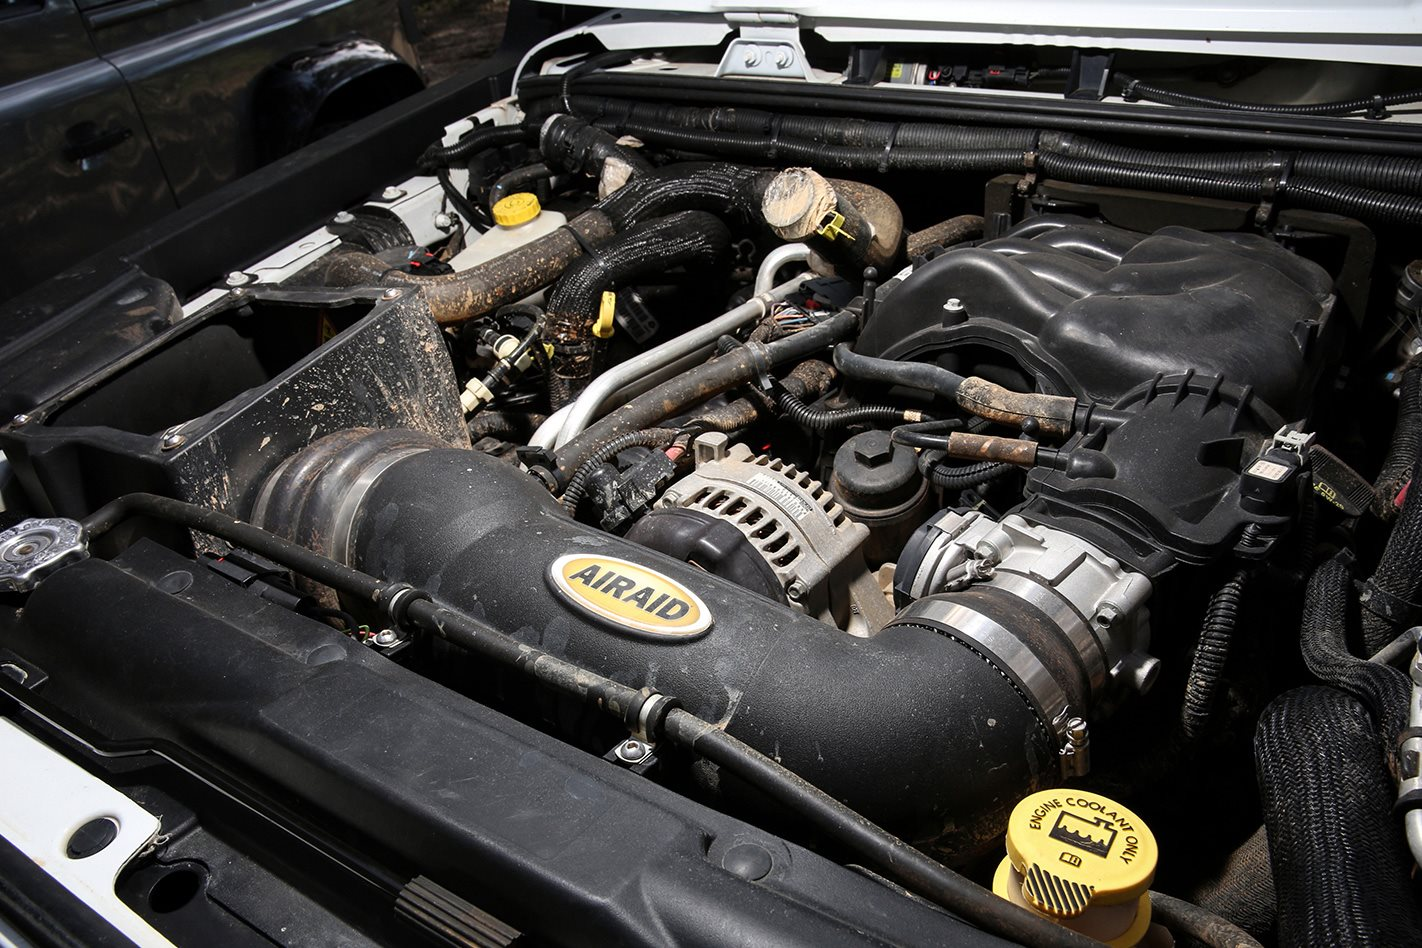 2013-Jeep-Wrangler-Rubicon-engine.jpg